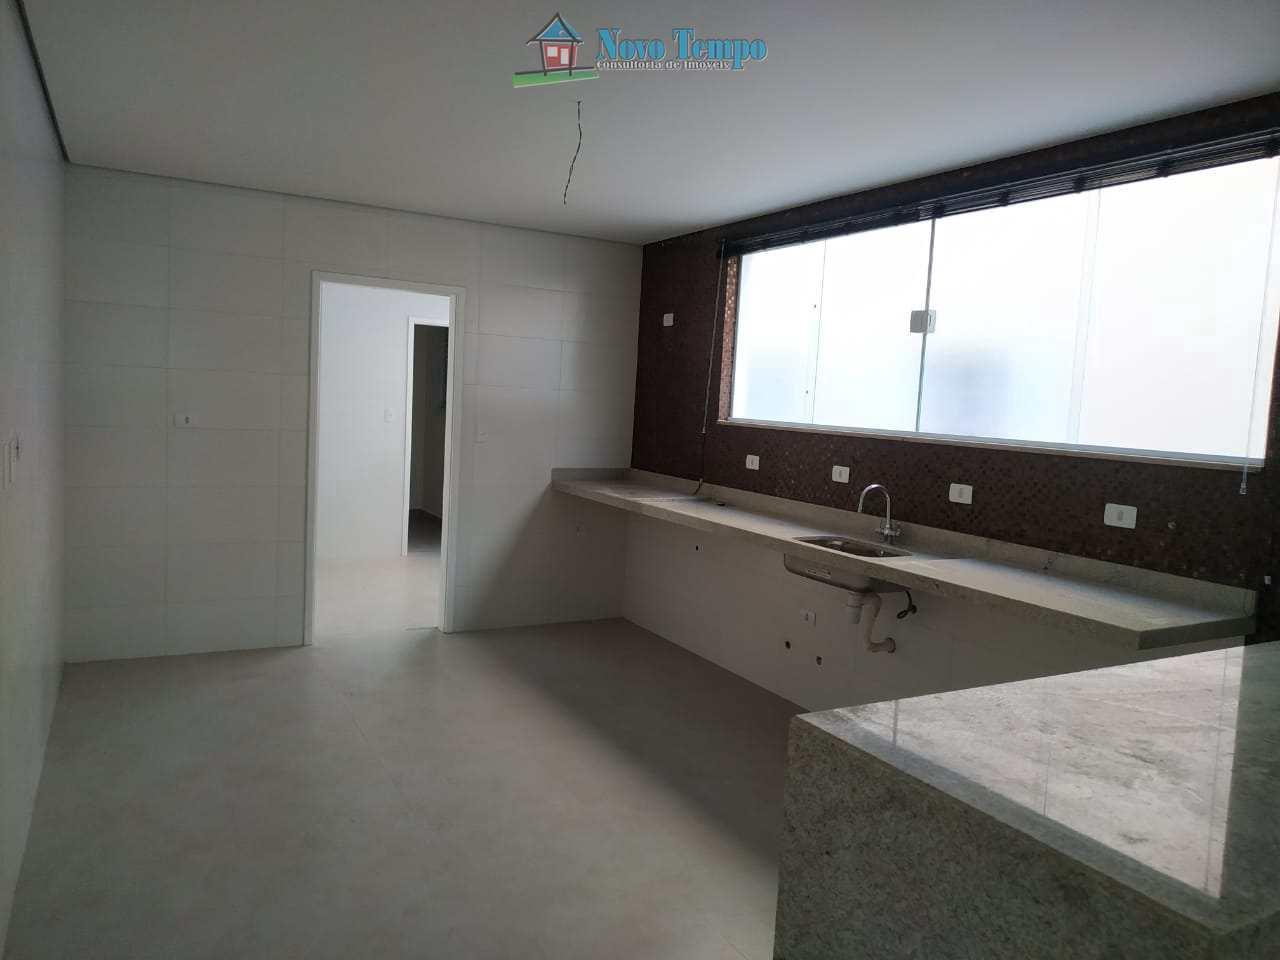 Casa com 4 dorms, Embaré, Santos - R$ 1.61 mi, Cod: 11336